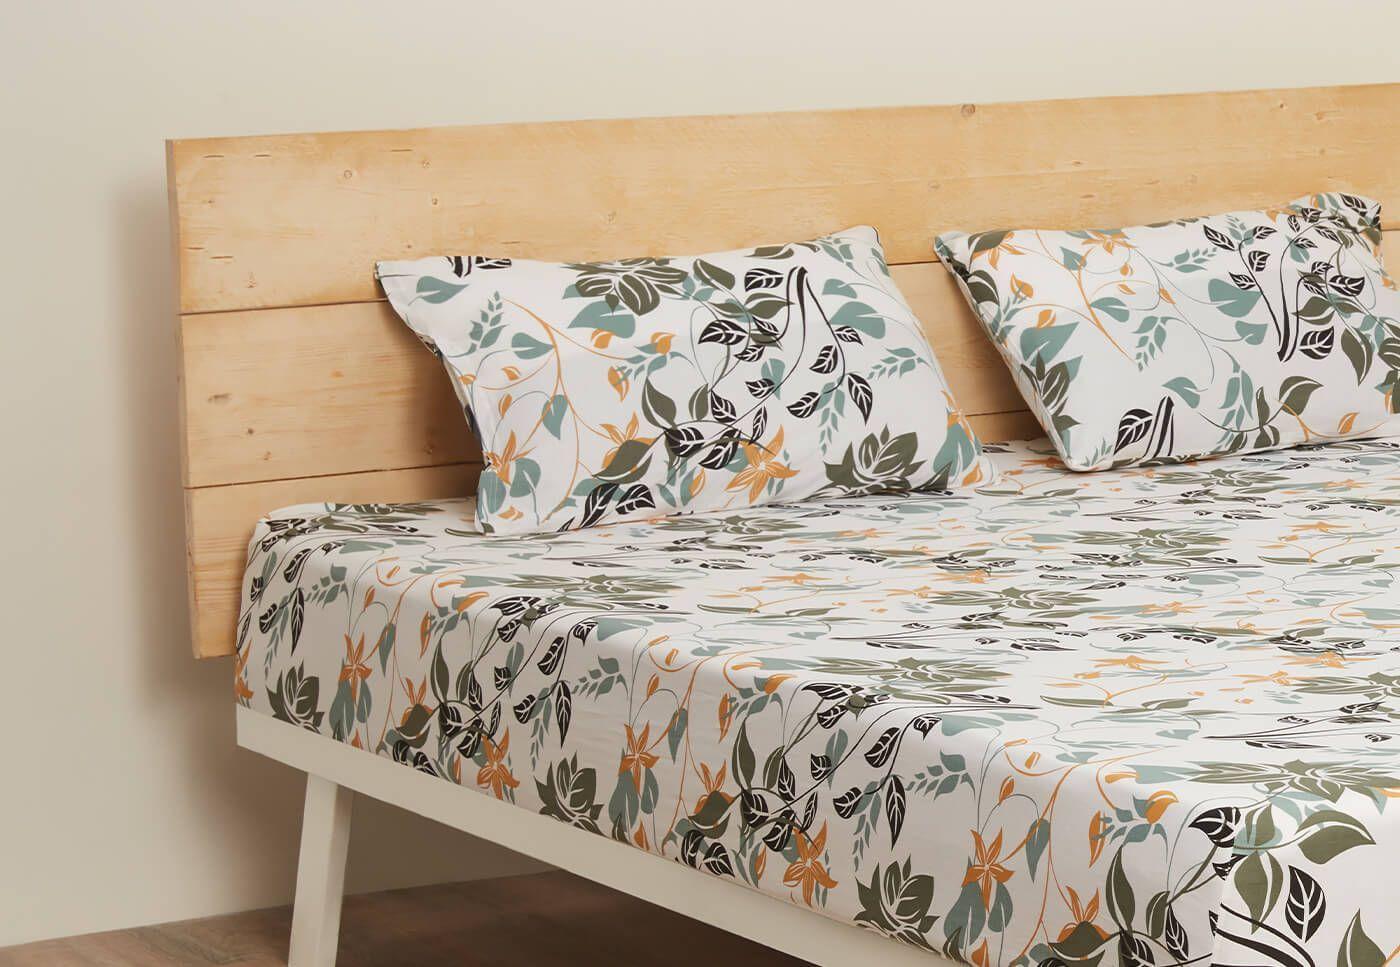 Best Bedsheet And Comforters Online At Best Price Wakefit Bedsheet Comforters Online Price Wakefit Mattress In 2020 Bed Sheets Blanket Price Online Mattress